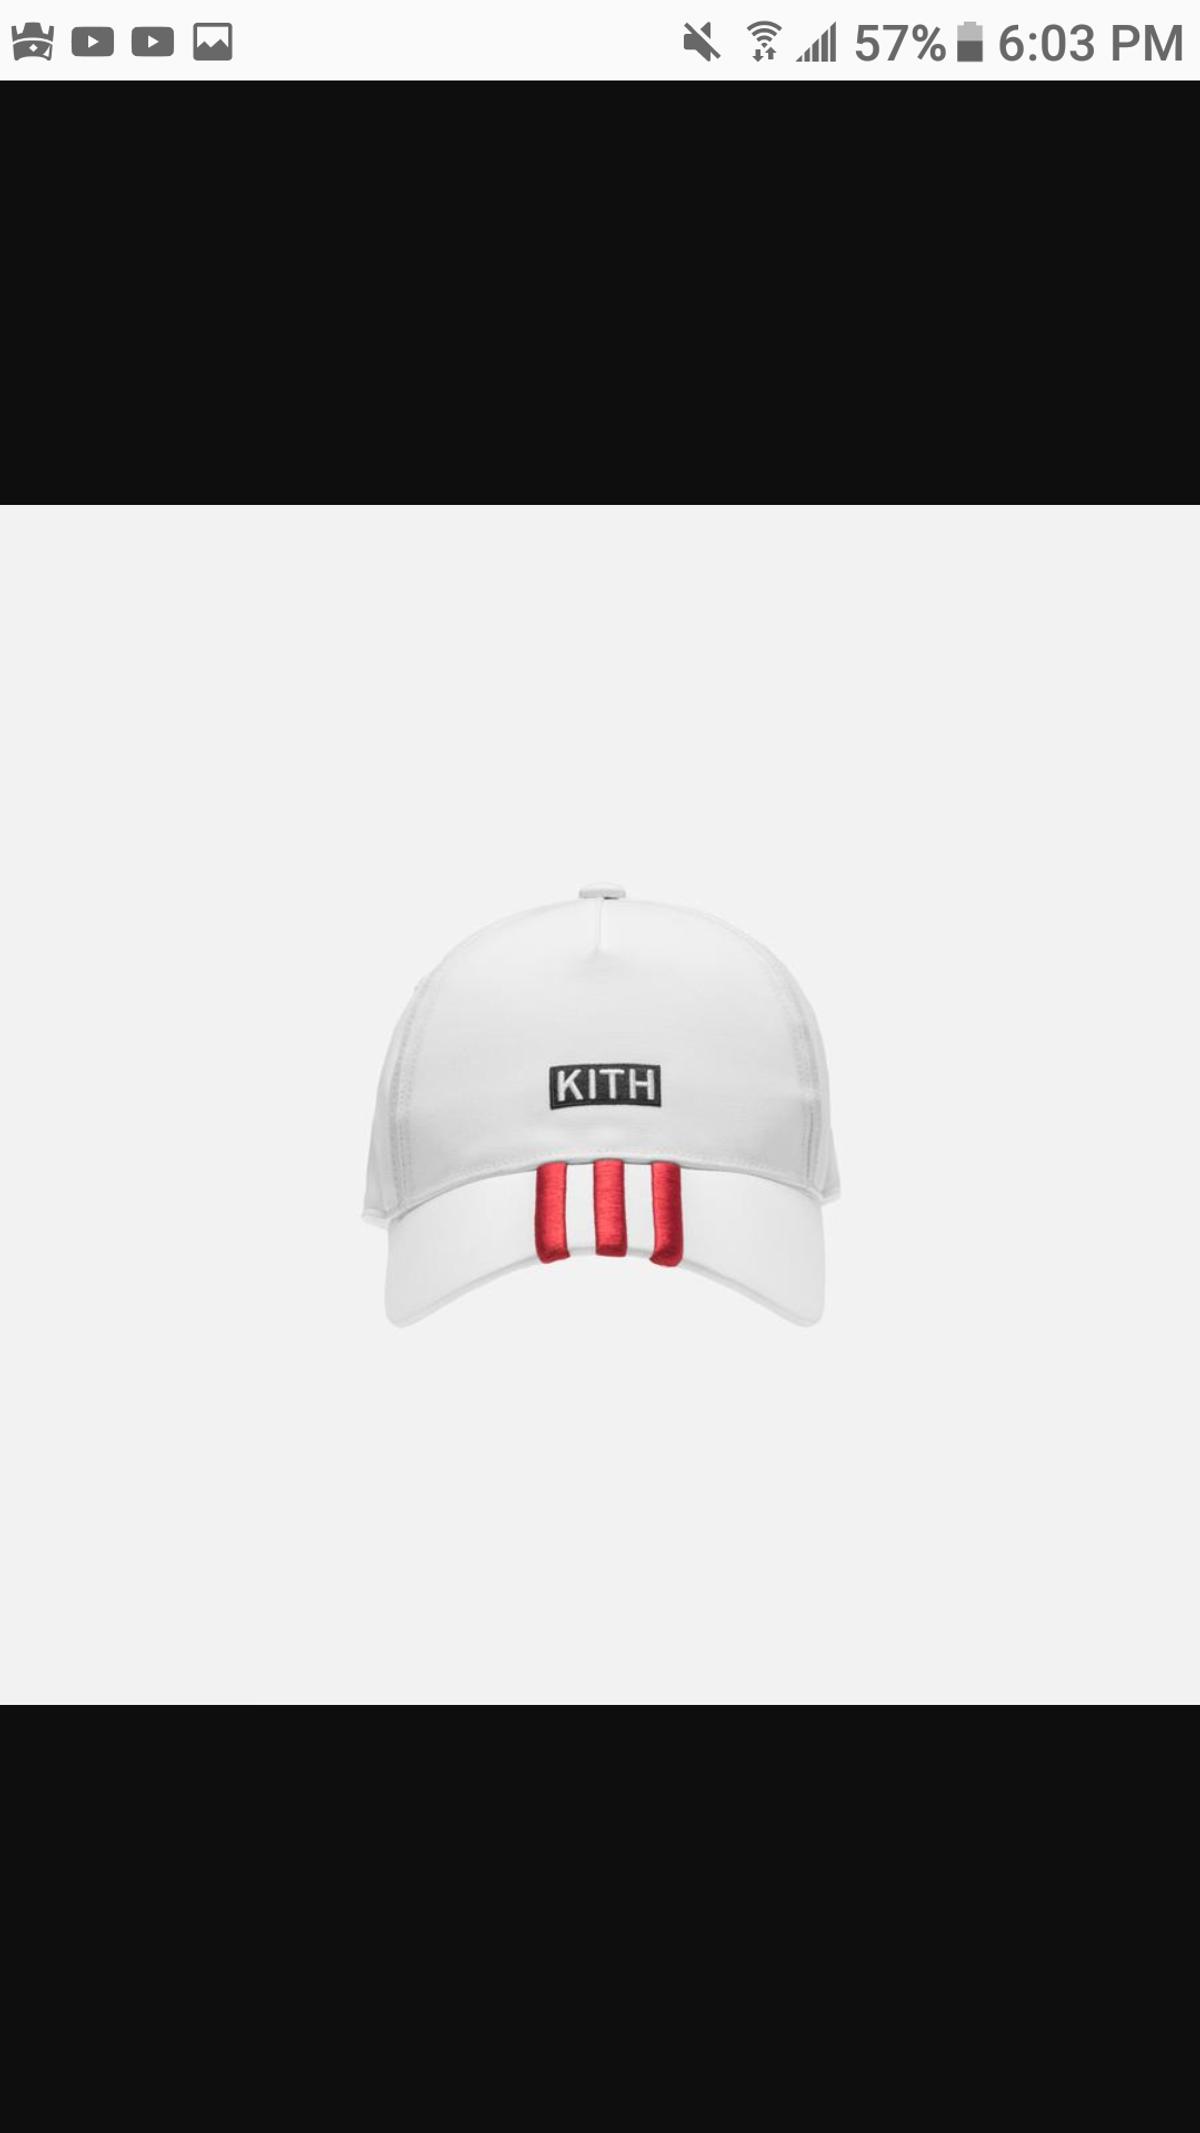 9dffee3c08e37 Kith Nyc ×. Kith x Adidas cobra hat